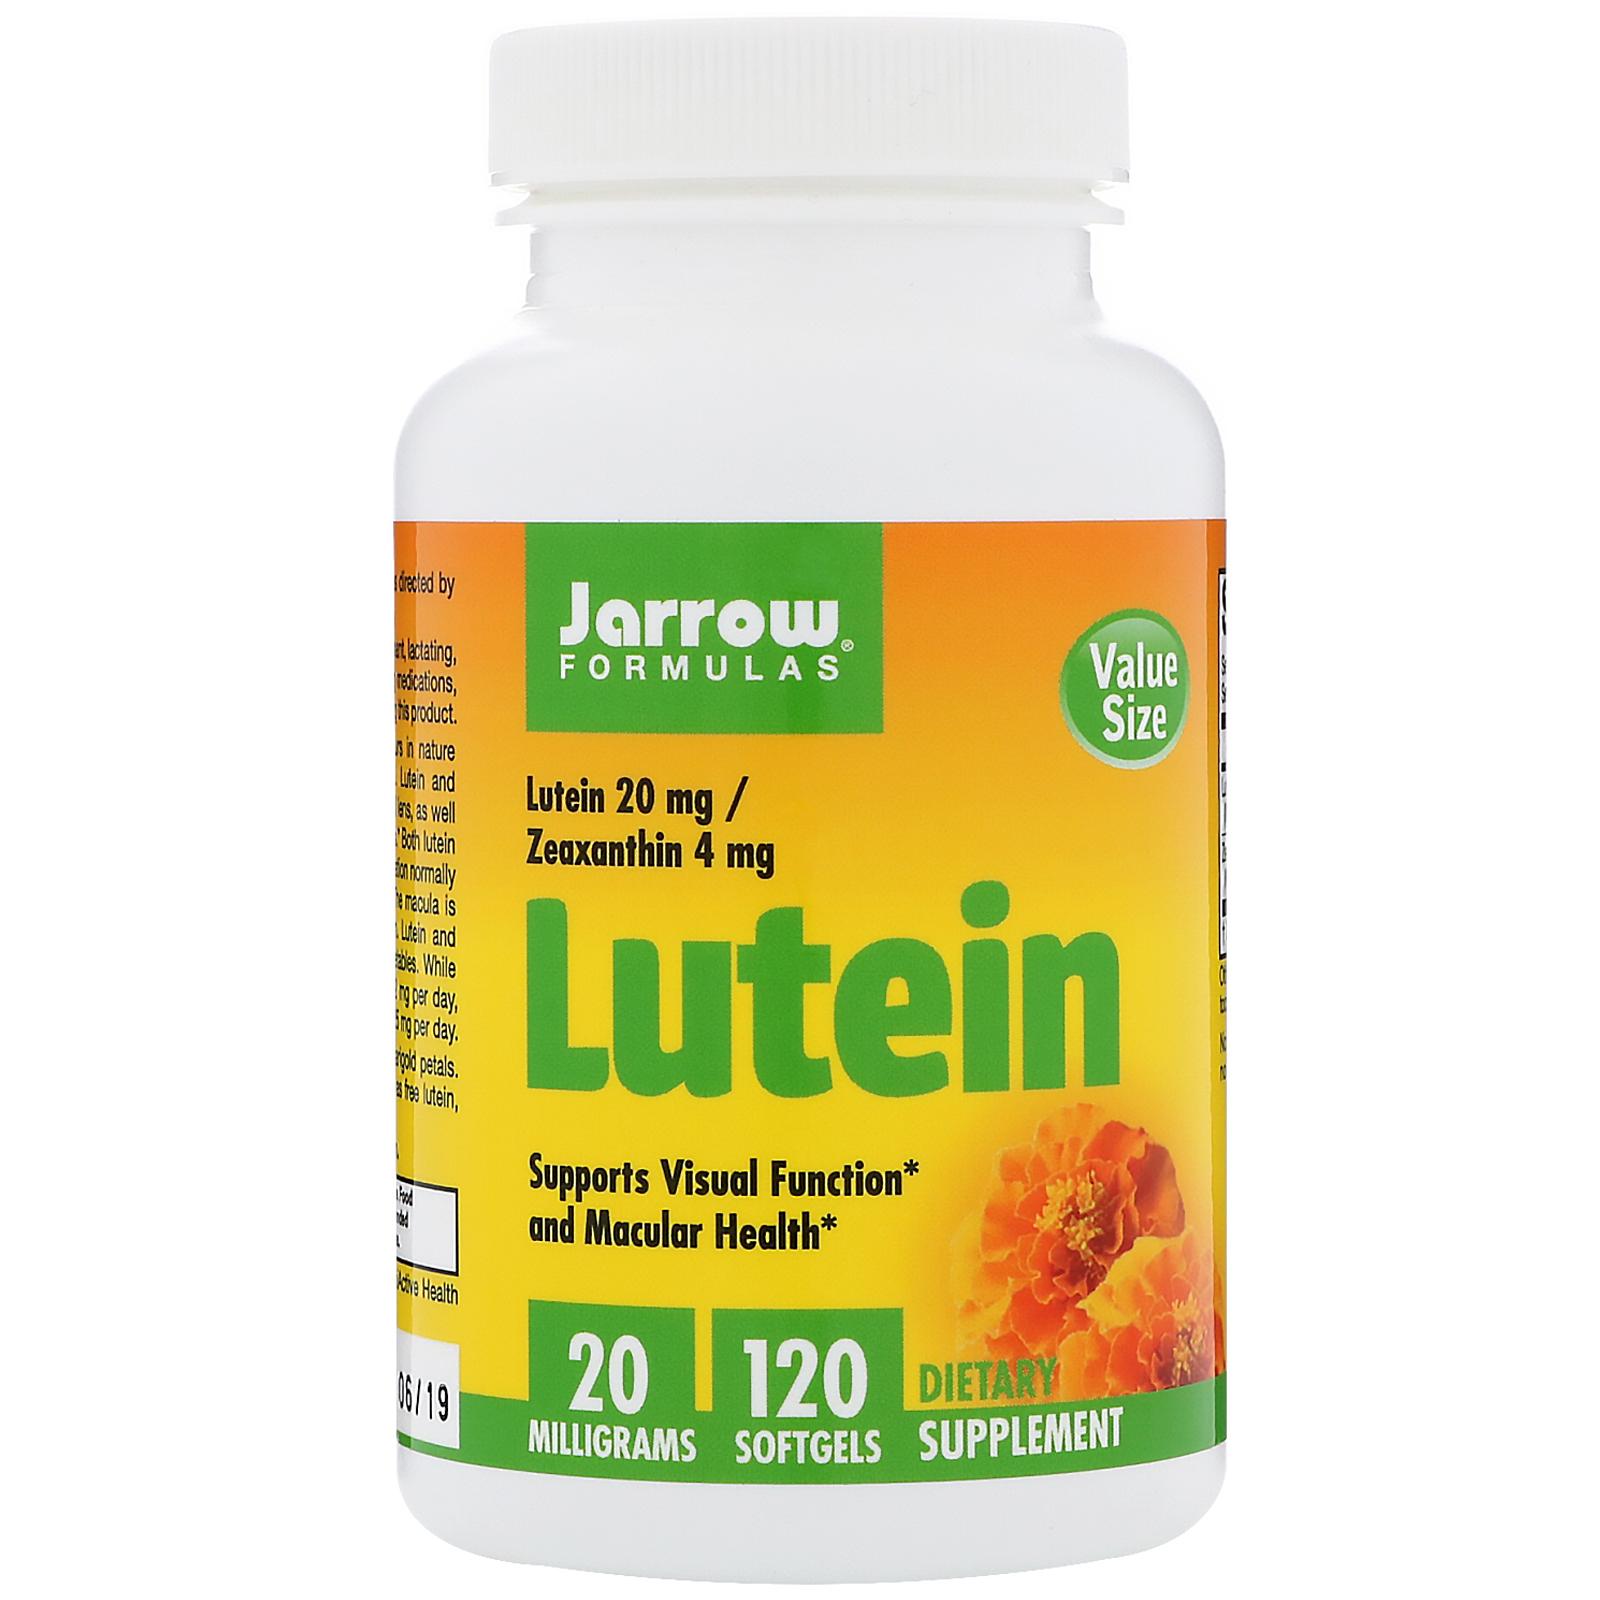 Jarrow Formulas, Lutein, 20 mg, 120 Softgels